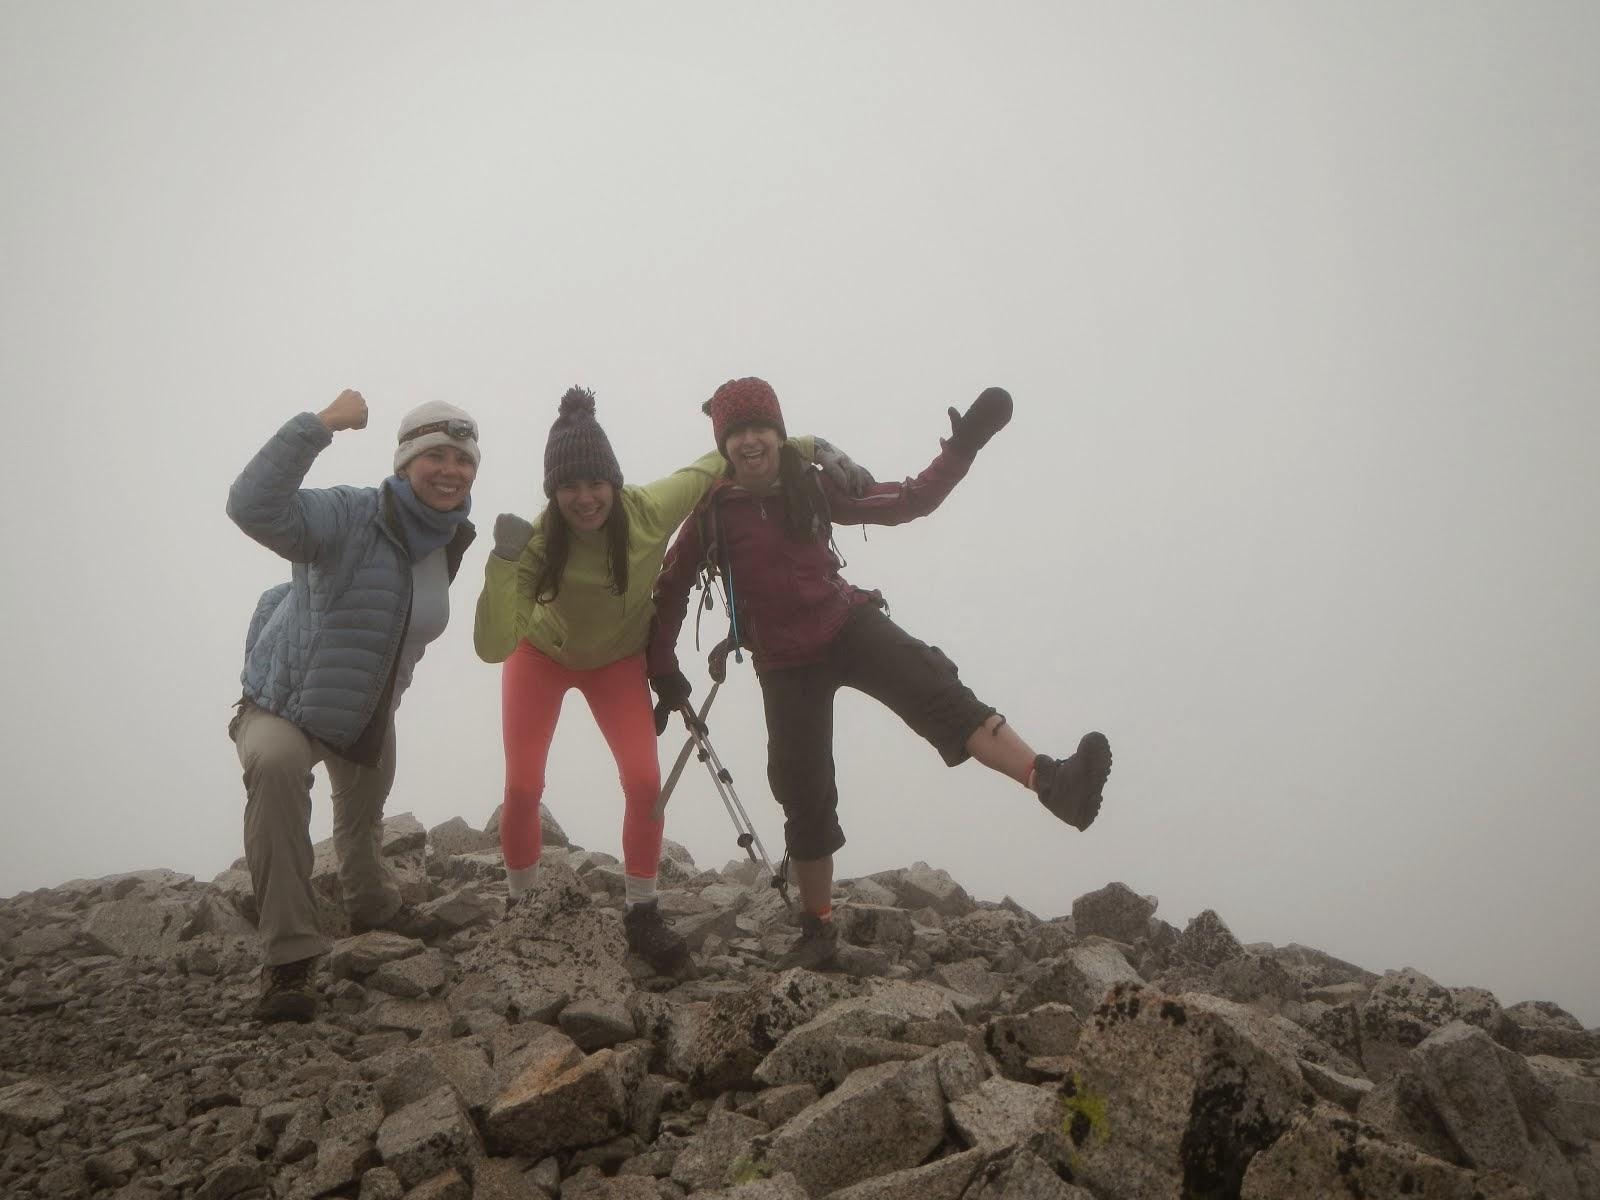 Mt. Princeton 14,197 feet